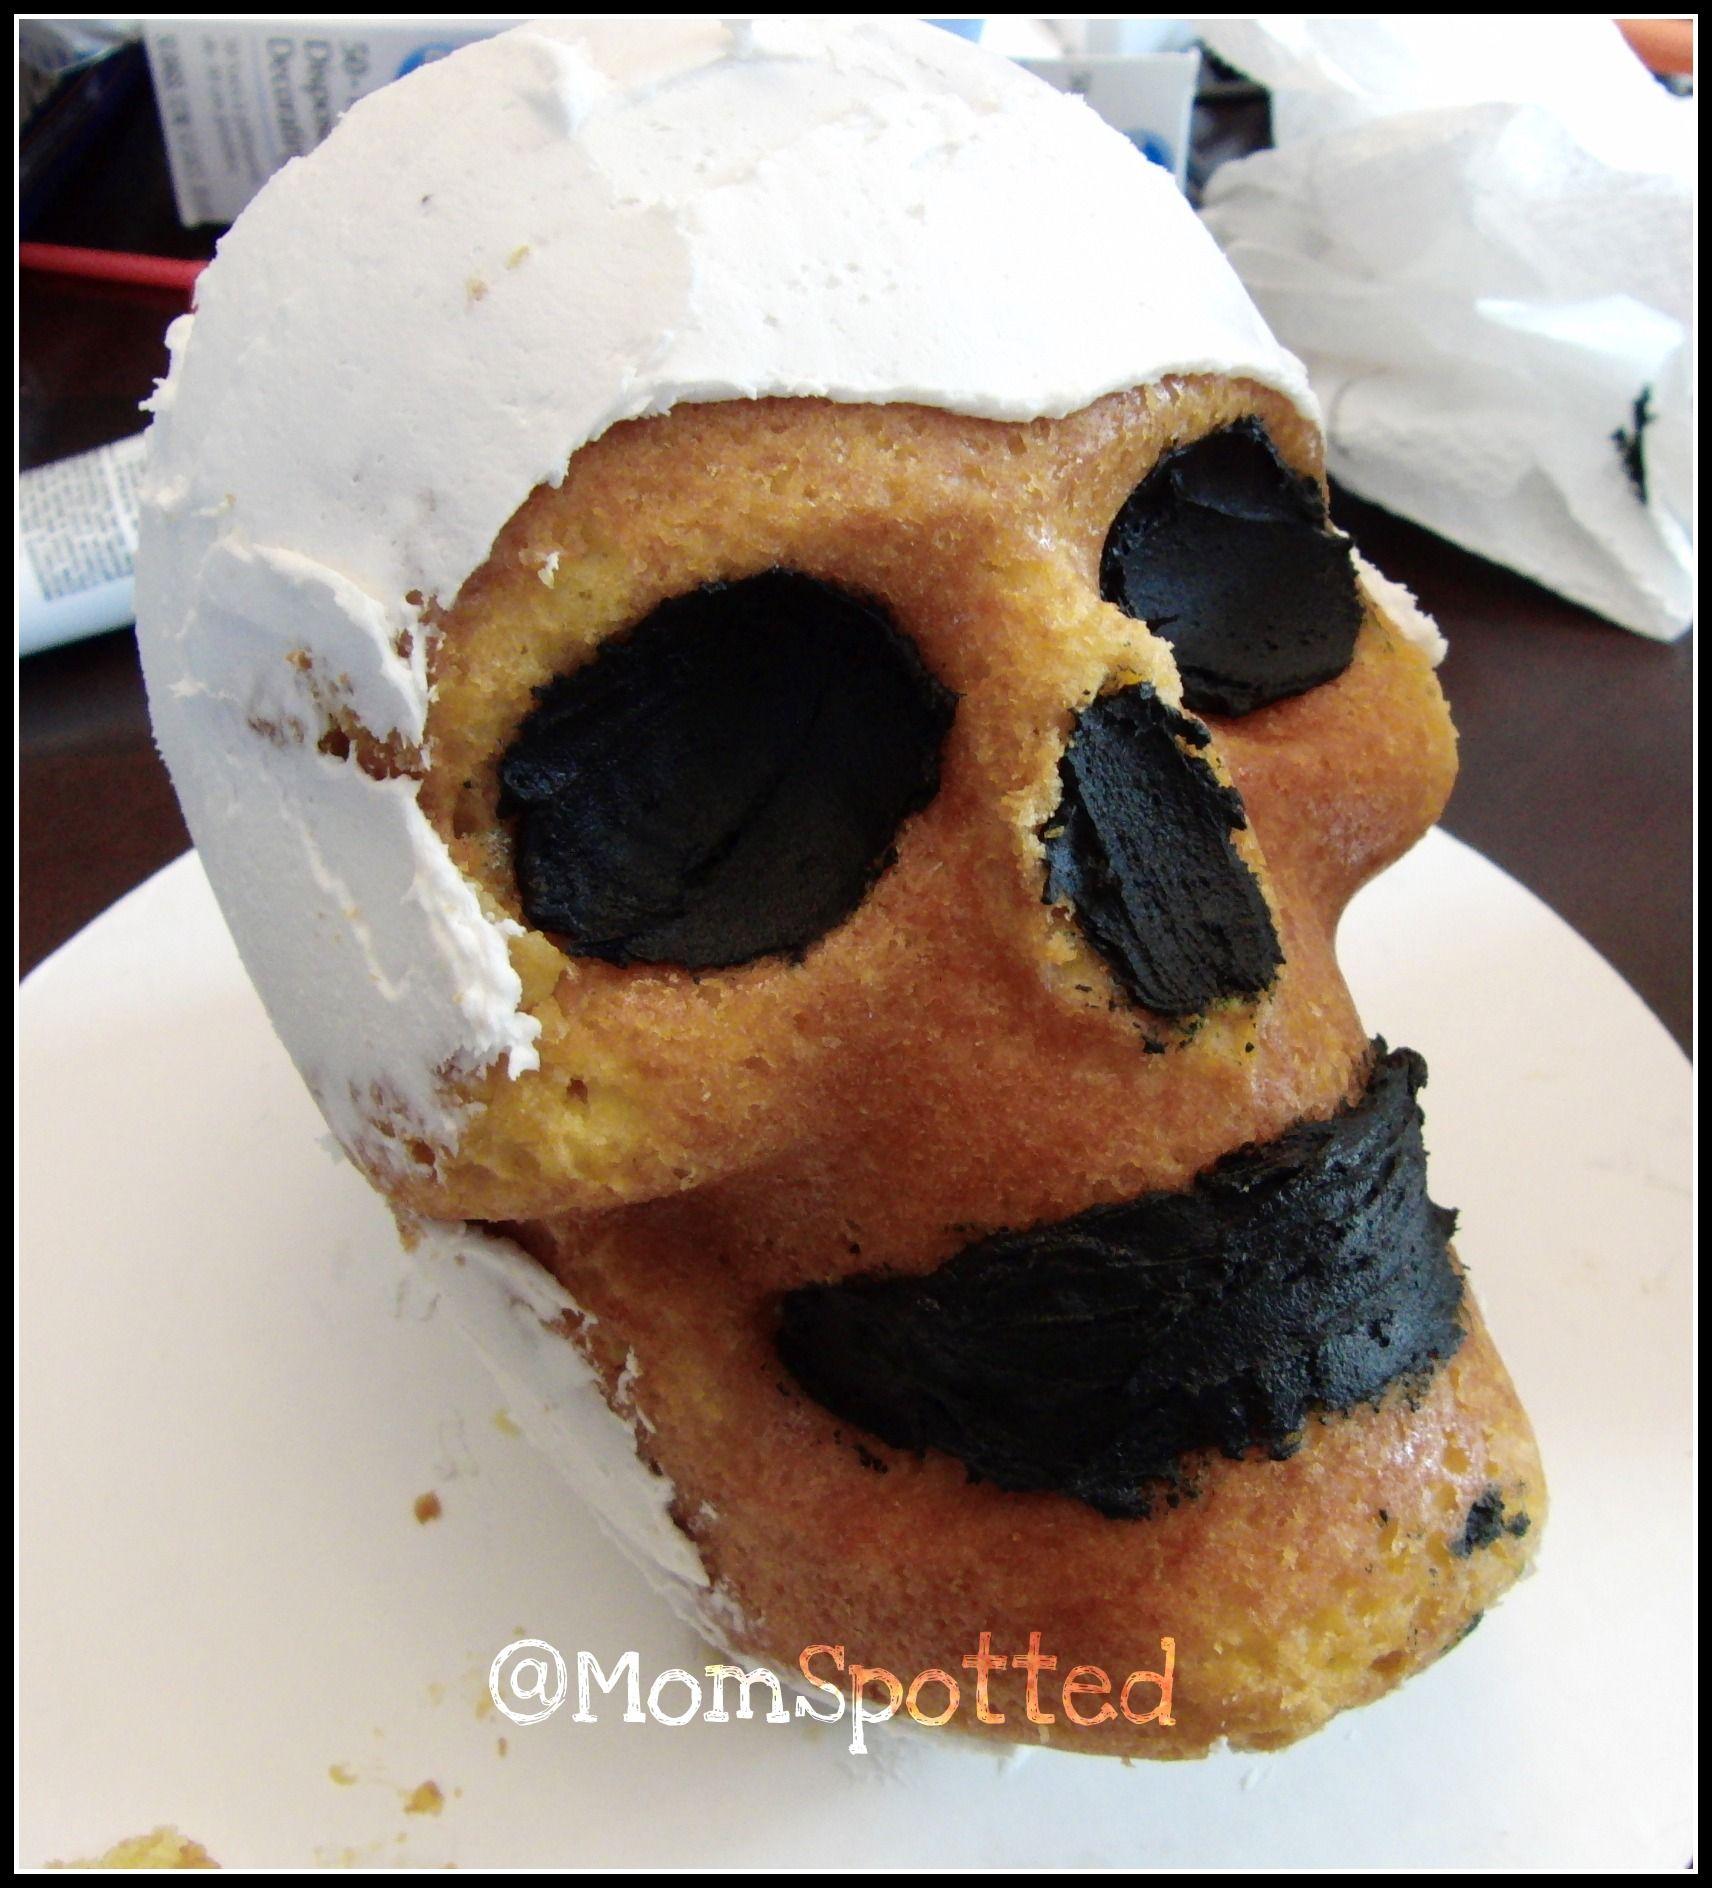 Wilton Dimensions 174 3 D Skull Pan Tutorial Skull Cake